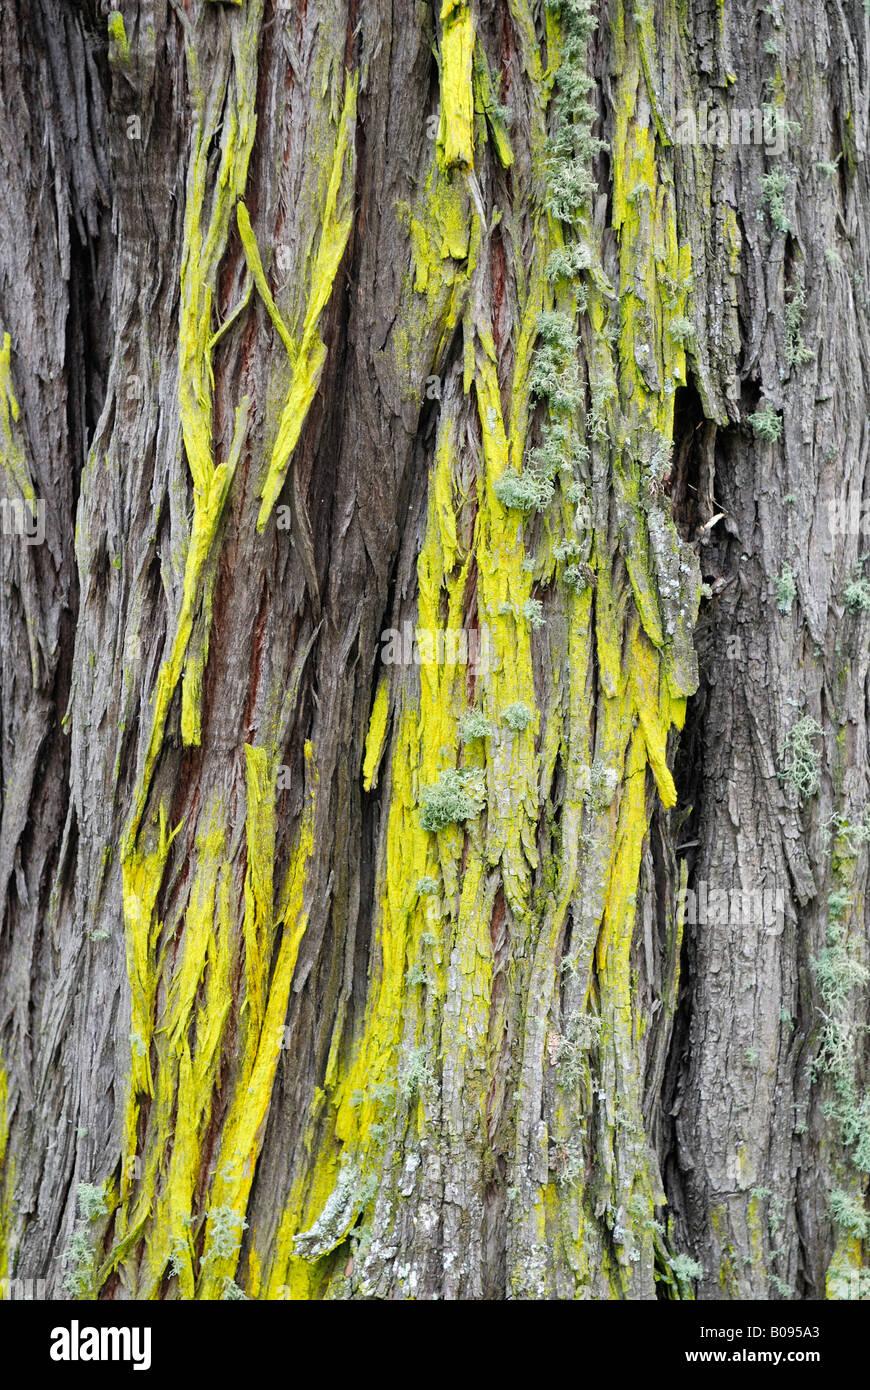 Lichen growing on the bark of a Tuart Tree (Eucalyptus gomphocephala), Tuart Forest National Park, Busselton, Western - Stock Image